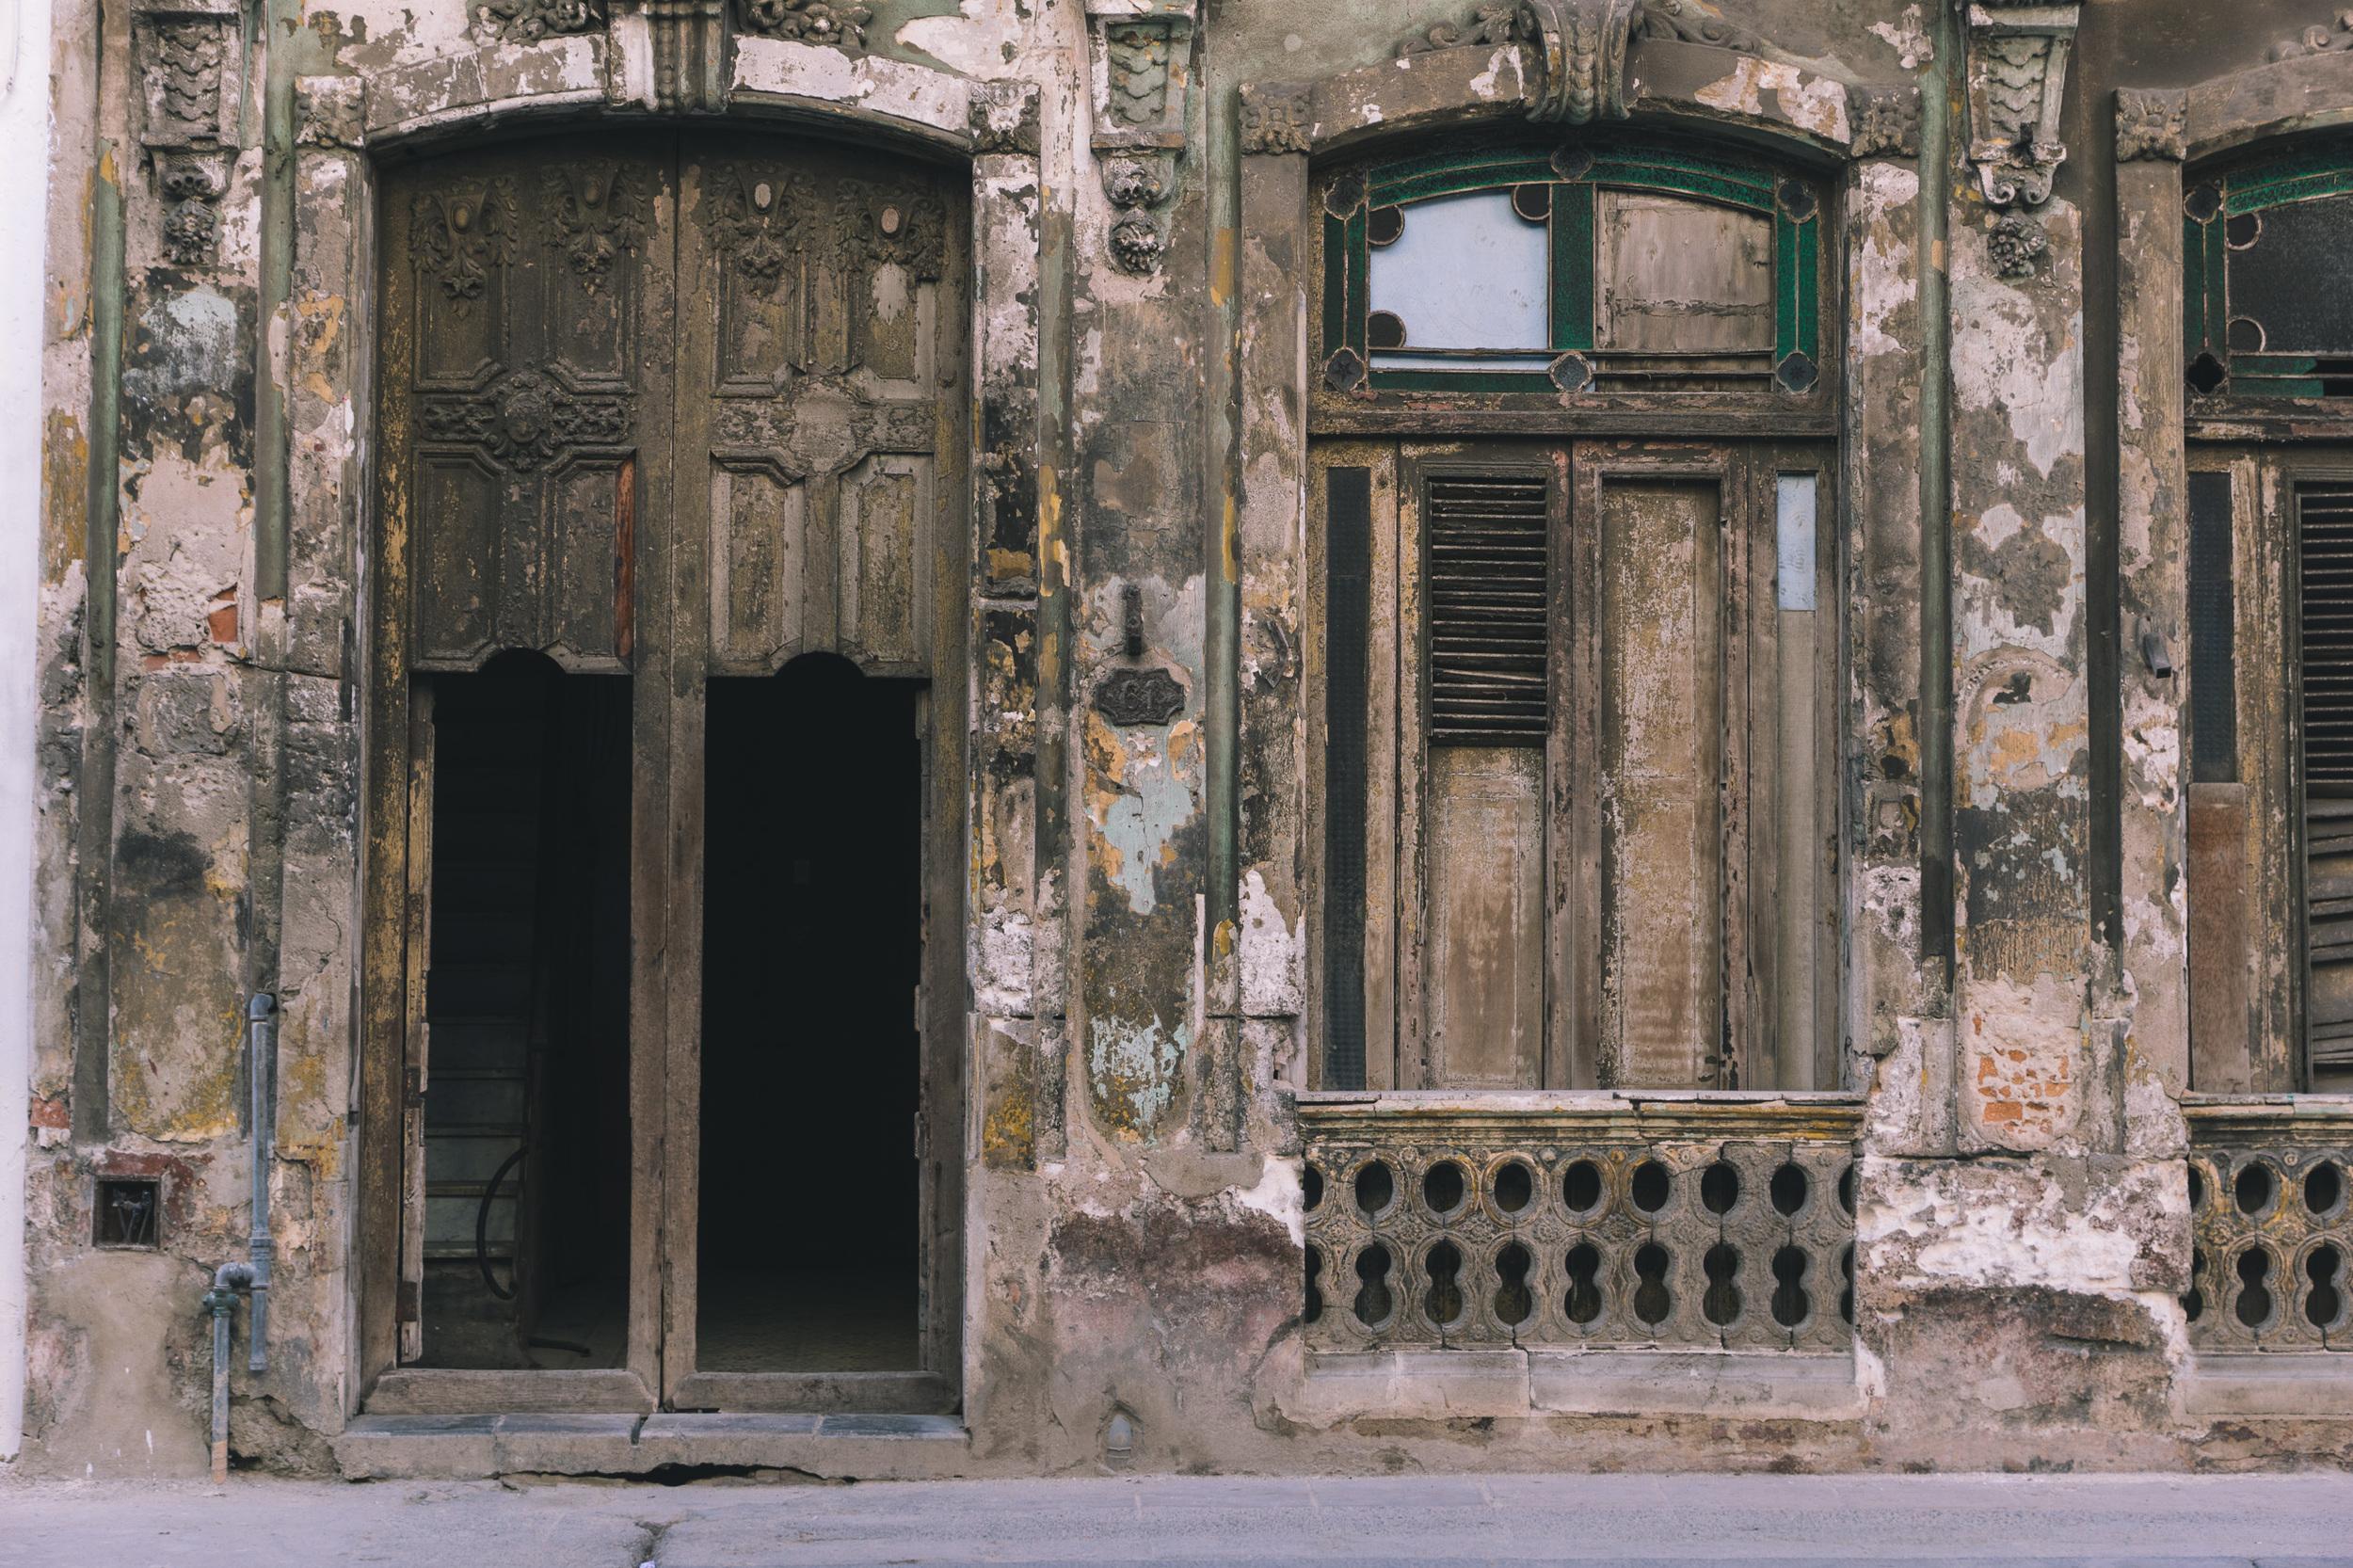 DeClaro-Photography-Cuba-02732.jpg